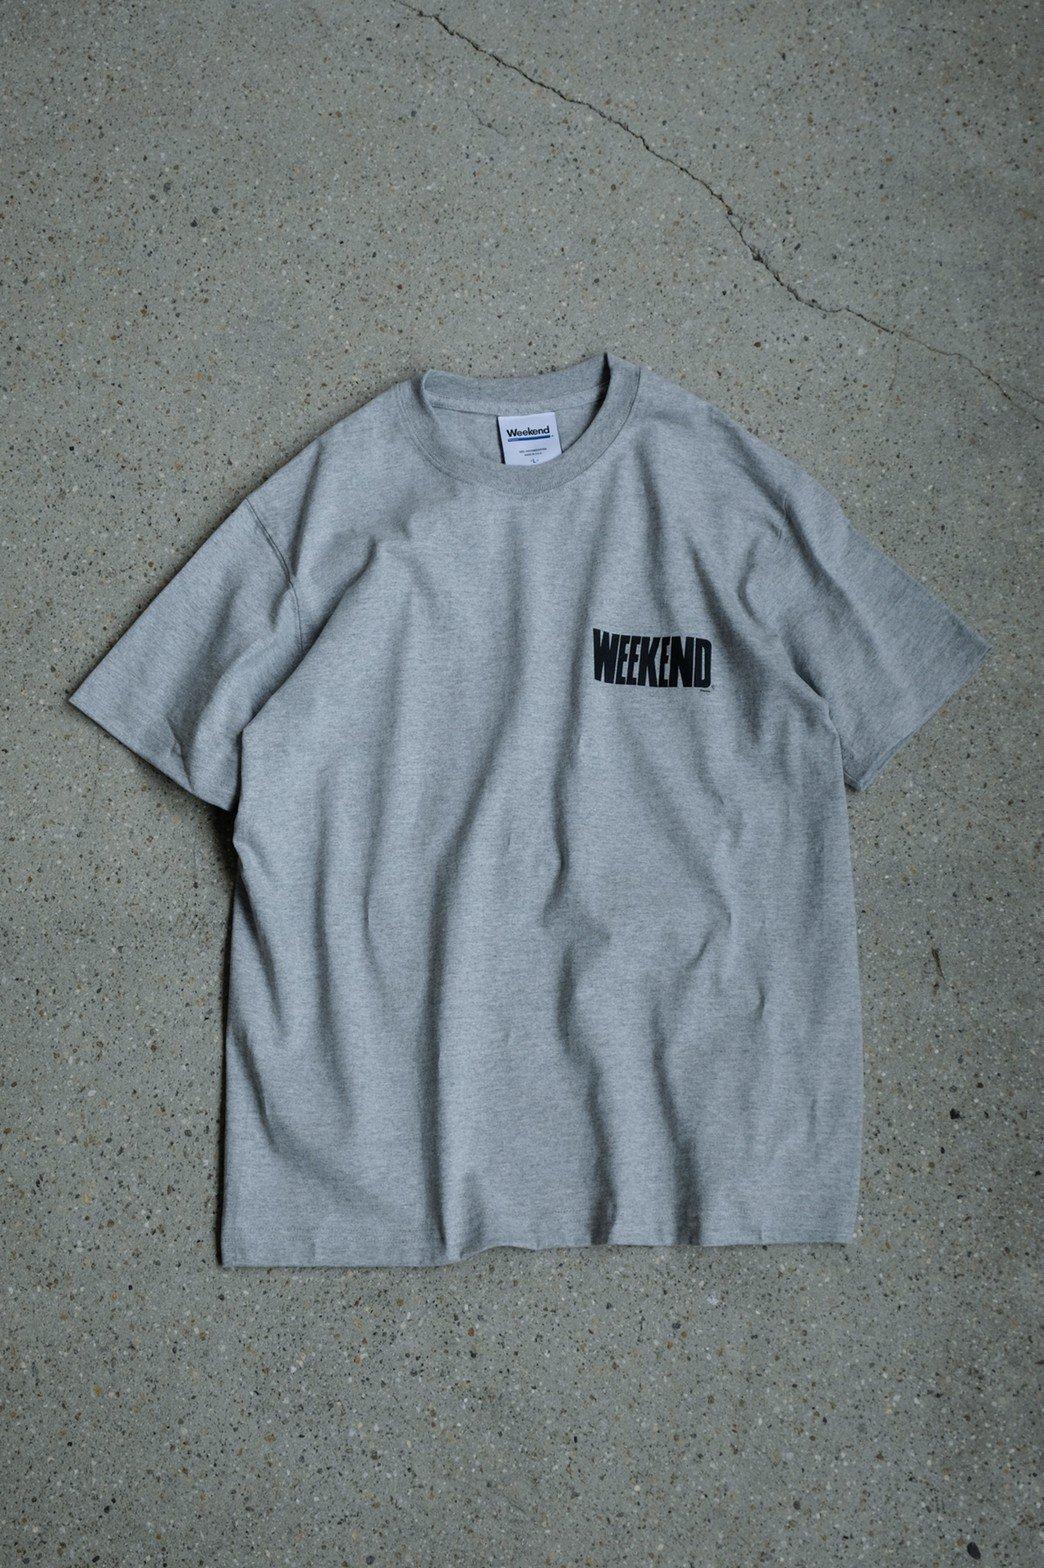 WEEKEND / WEEKEND Magazine T-shirt GRAY